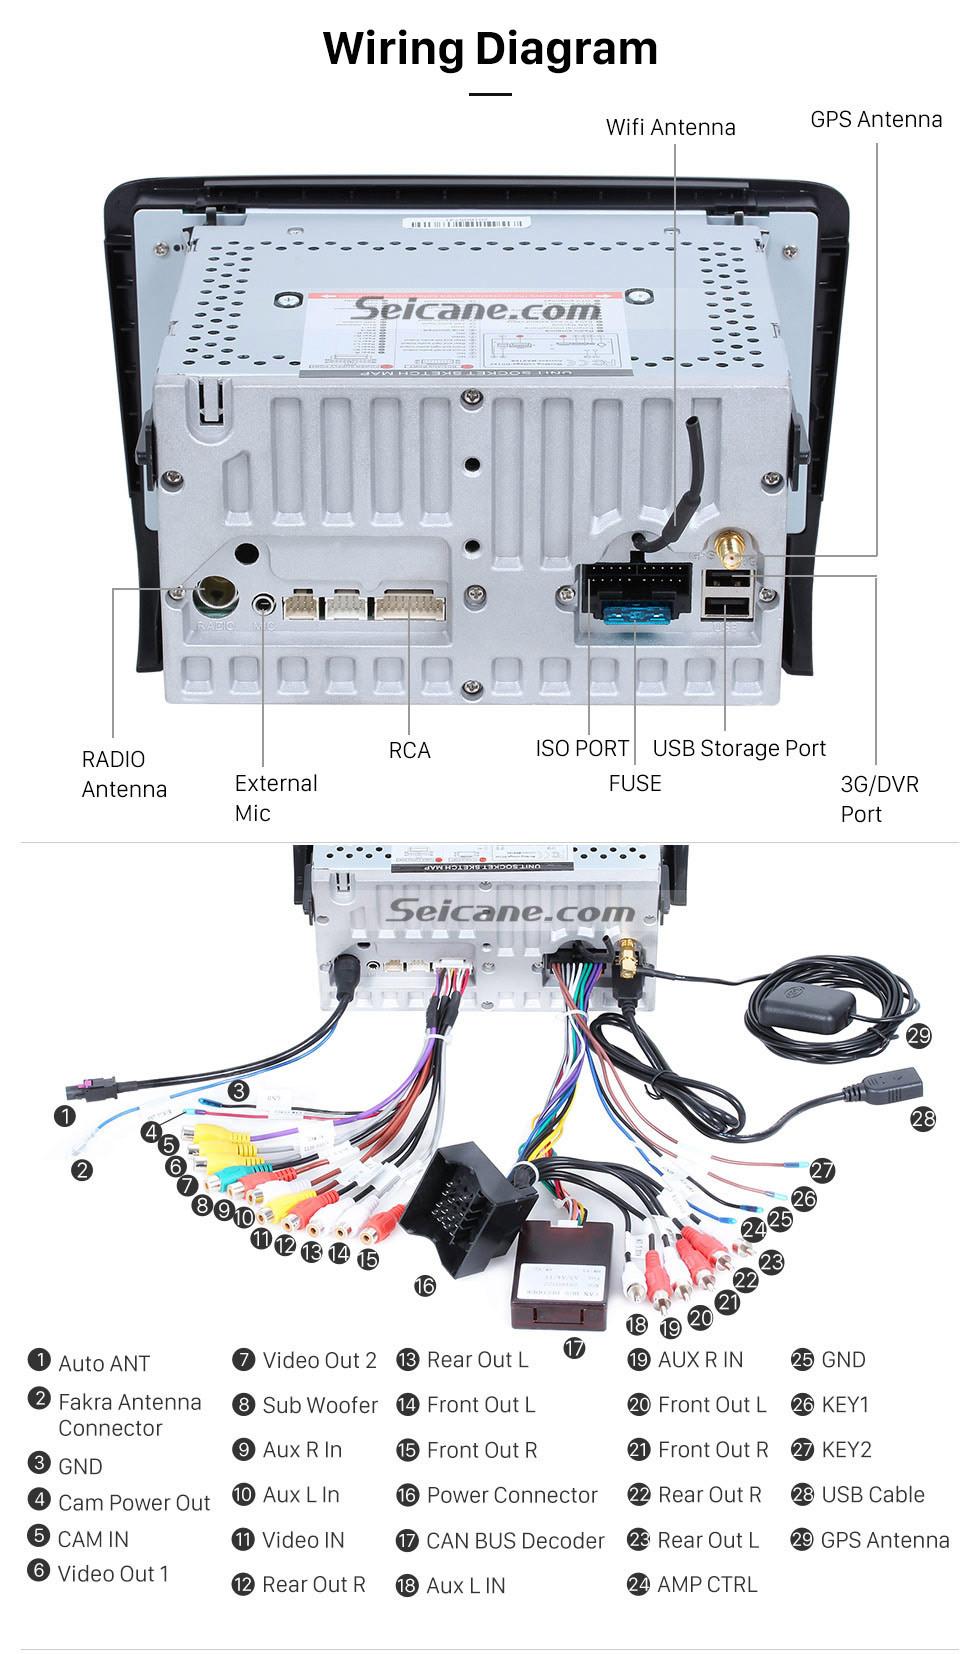 NY_8484] Wire Diagram For Aux Audi Simphony Schematic WiringStica Xaem Lious Ospor Adit Retr Pead Viha Hone Mentra Mohammedshrine  Librar Wiring 101